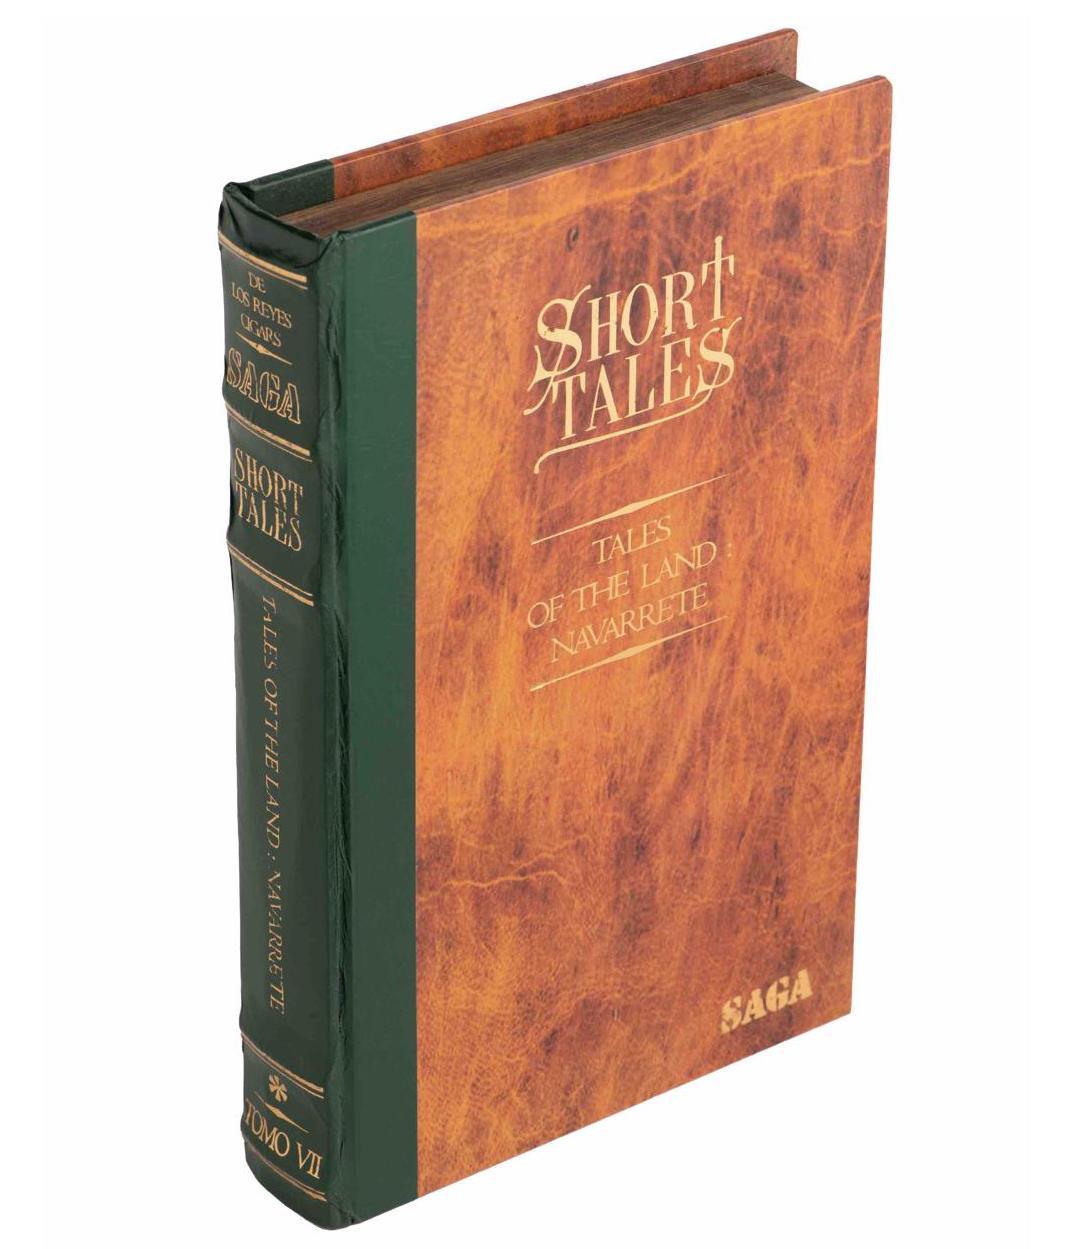 Cigar News: De Los Reyes Cigars Announces Saga Short Tales Tomo VII – Tales of the Land: Navarrete